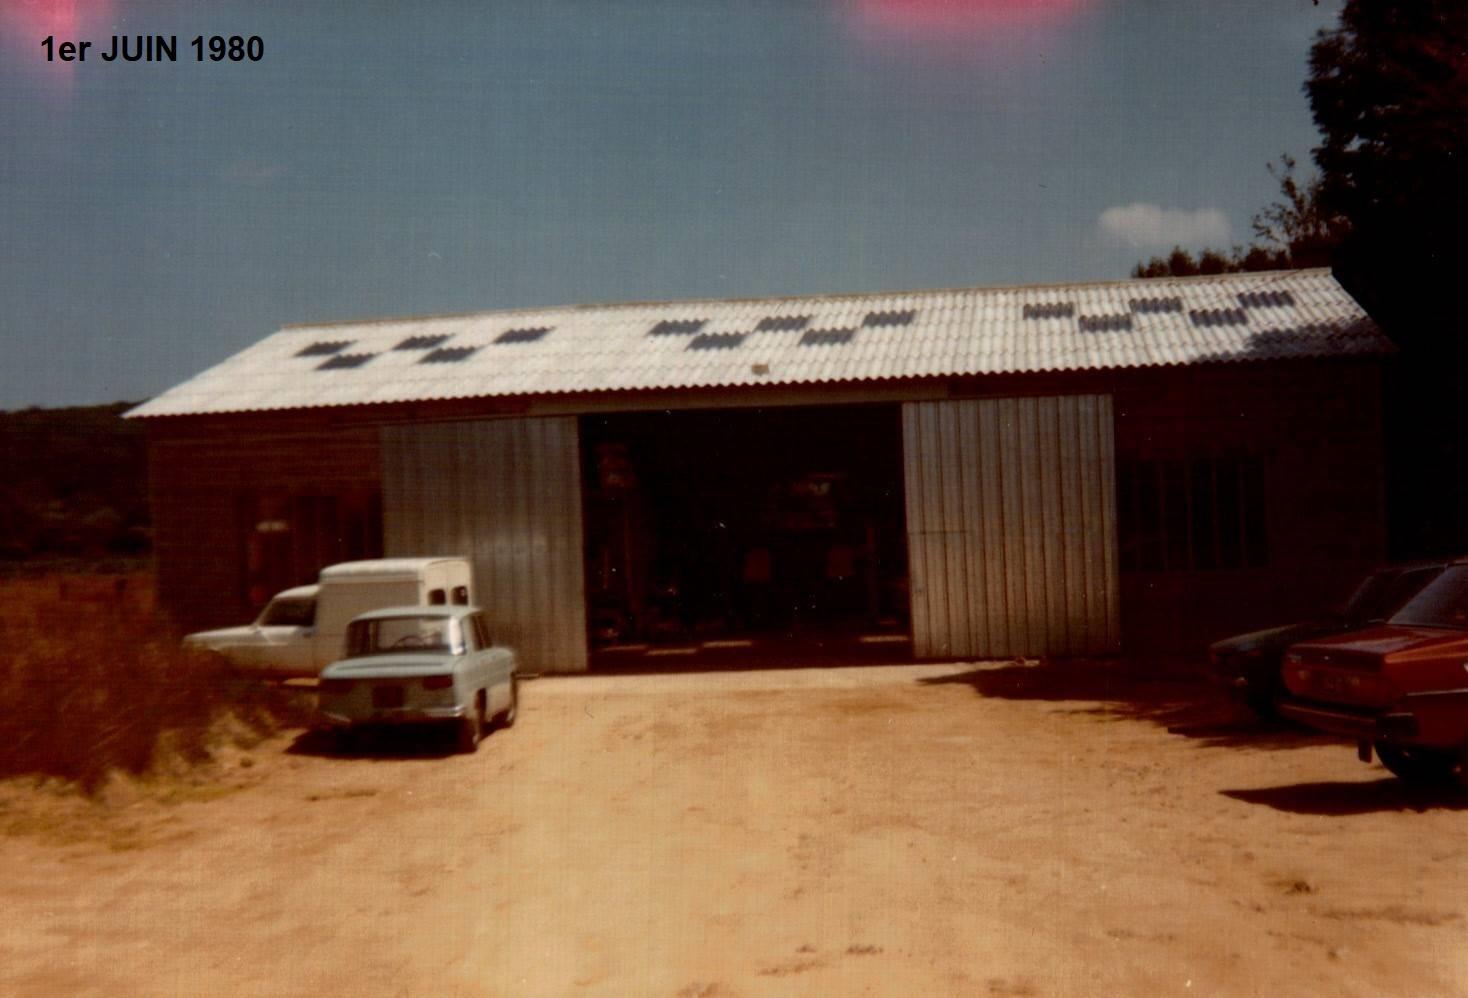 Photo 1 leguay juin 1980